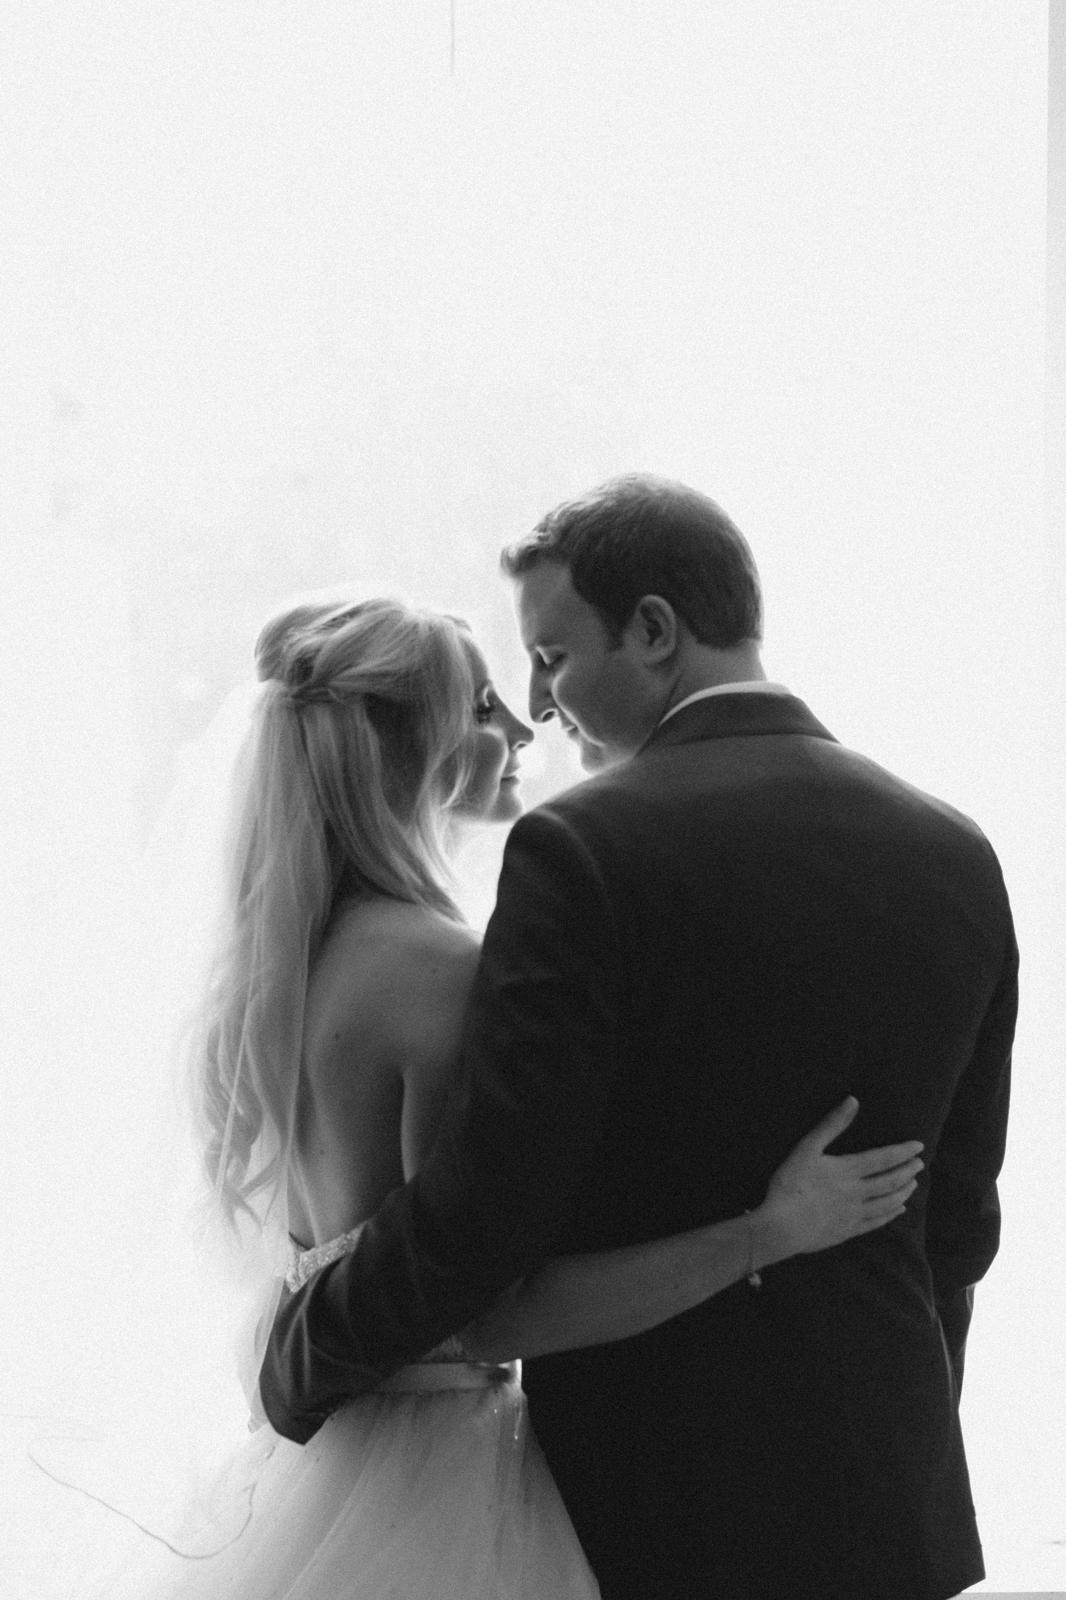 NYC Wedding Photography Sofitel Central Park Brooklyn Photographer Boris Zaretsky _B2C1979-2.jpg